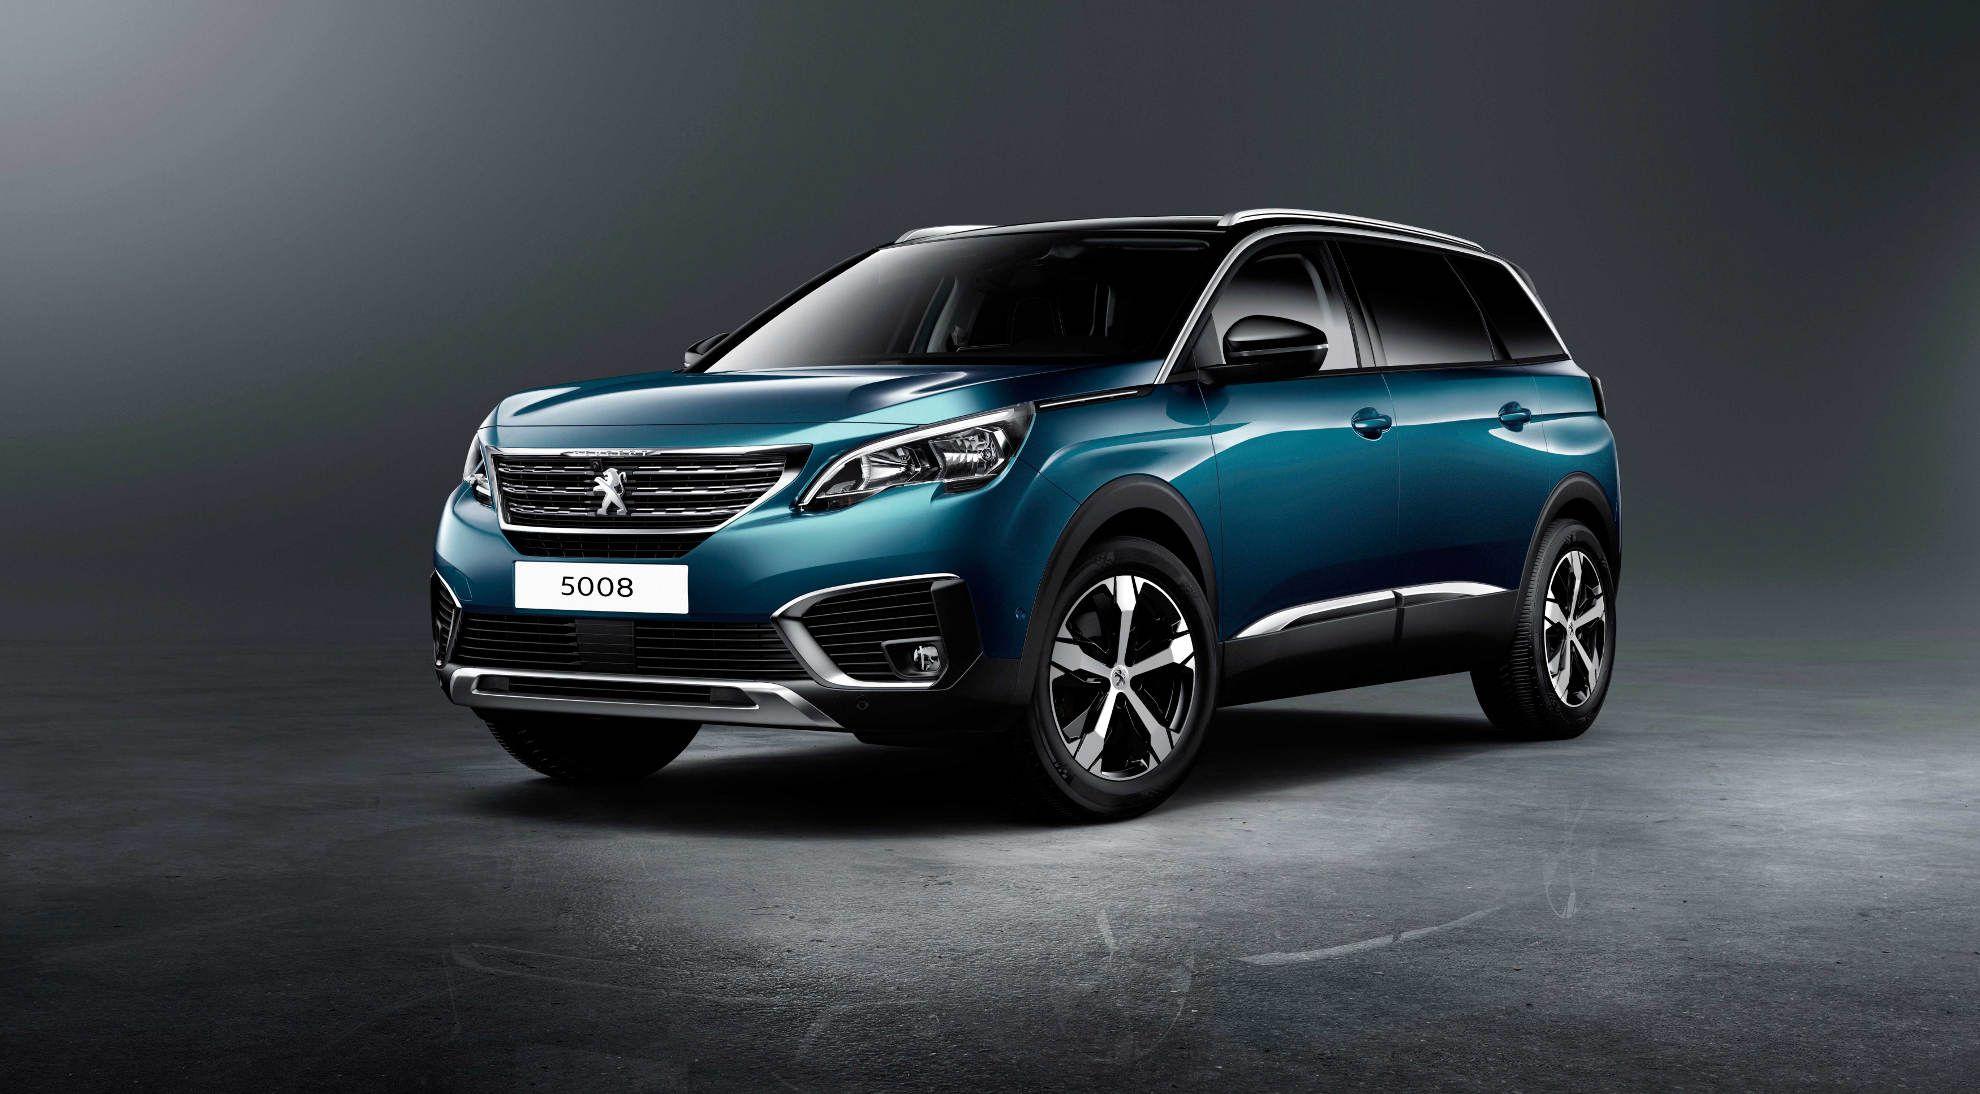 Peugeot 5008 modell 2017 frontperspektive